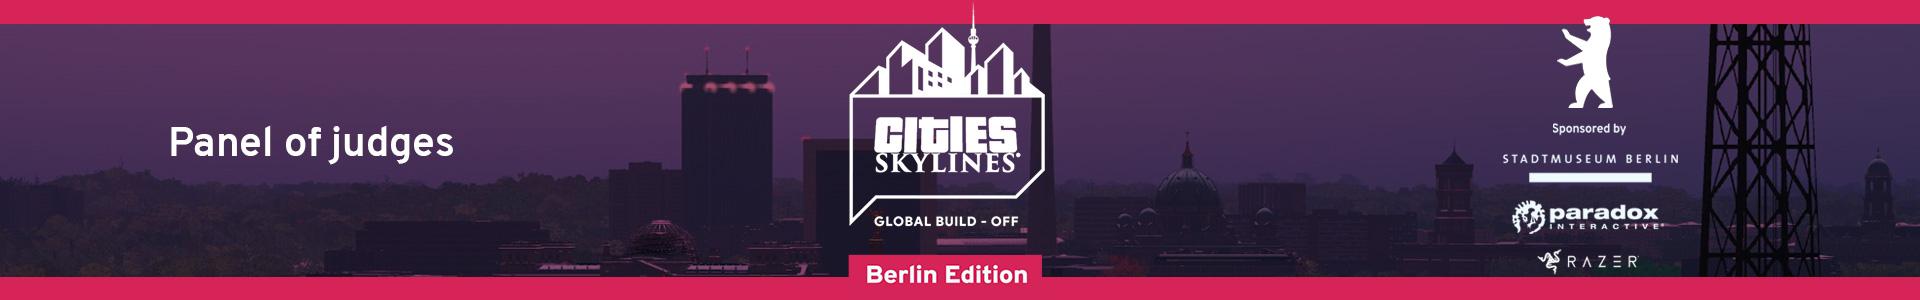 berlin-build-off-forums-banner-judges.jpg